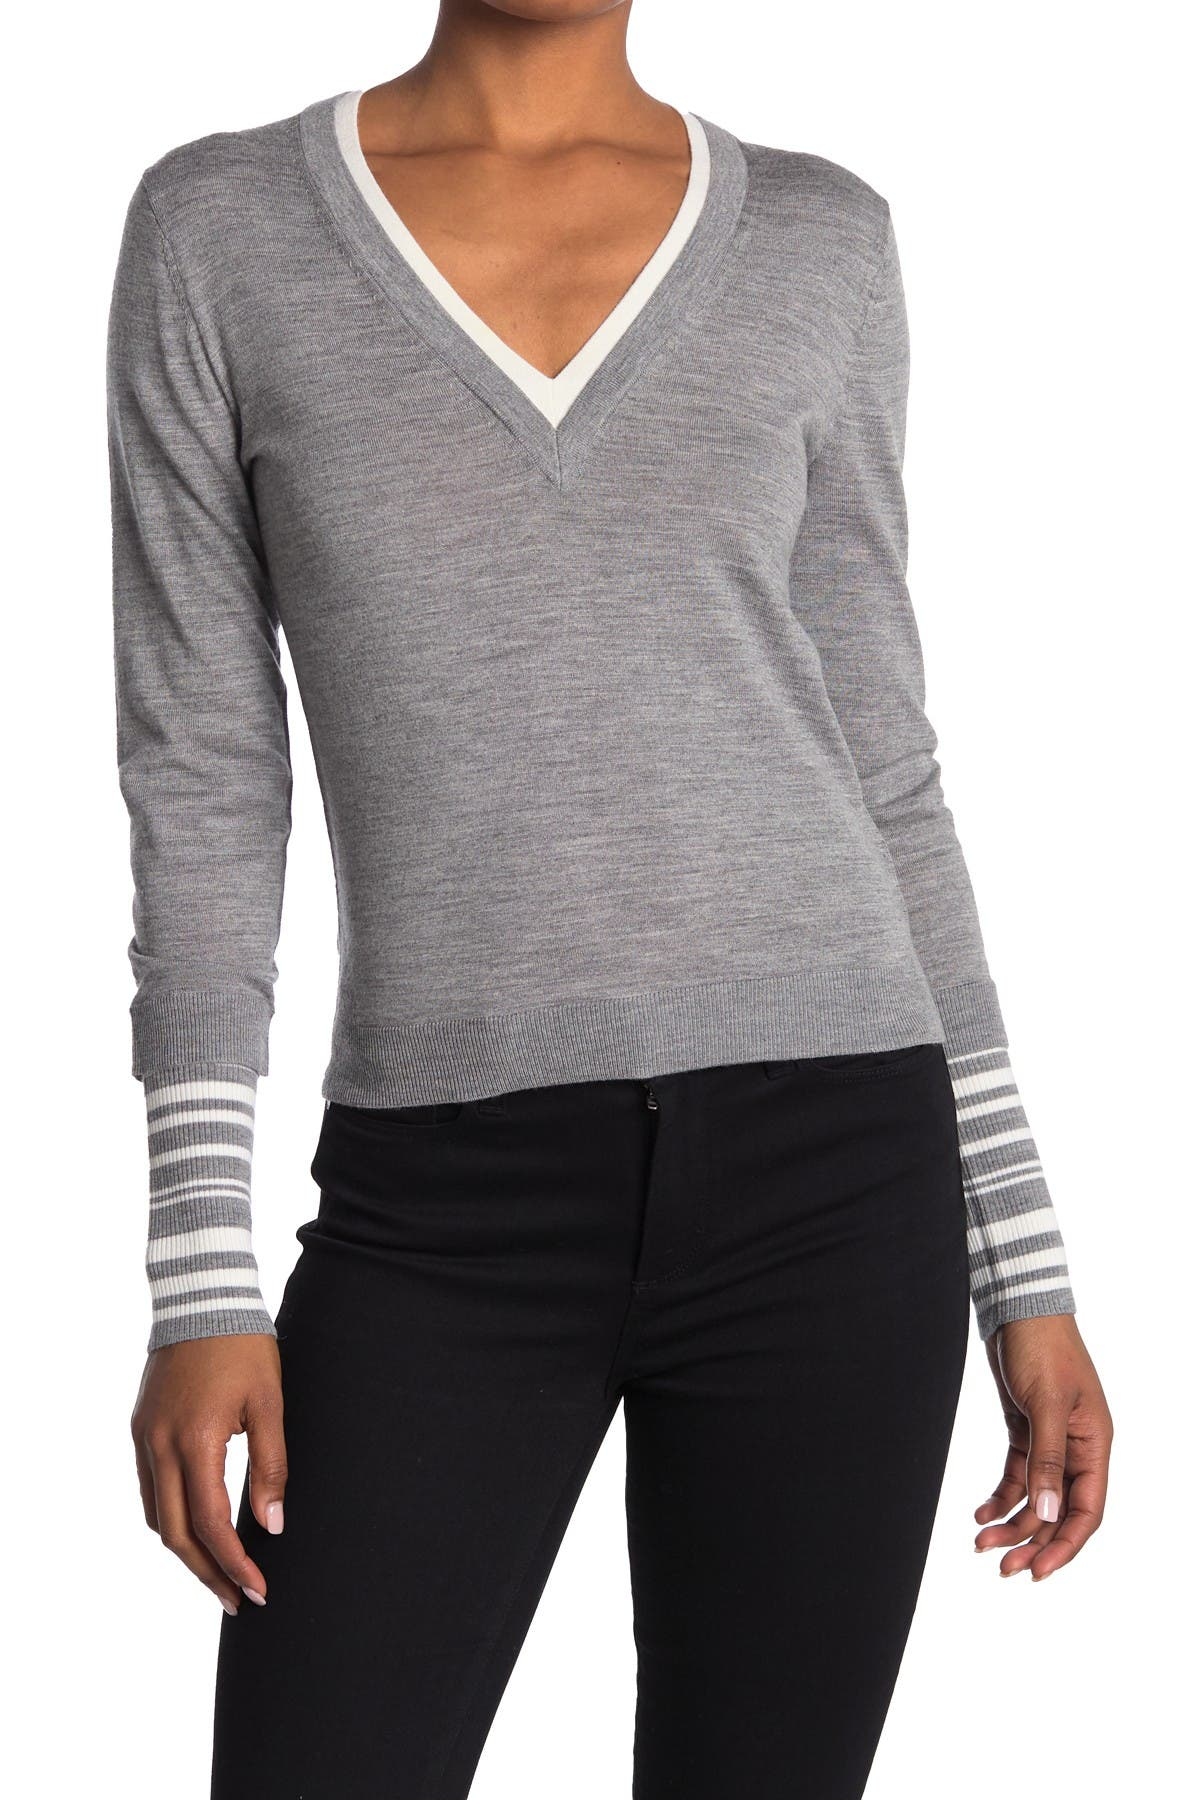 Image of VERONICA BEARD Avory Contrast Cuff Merino Wool Blend Sweater